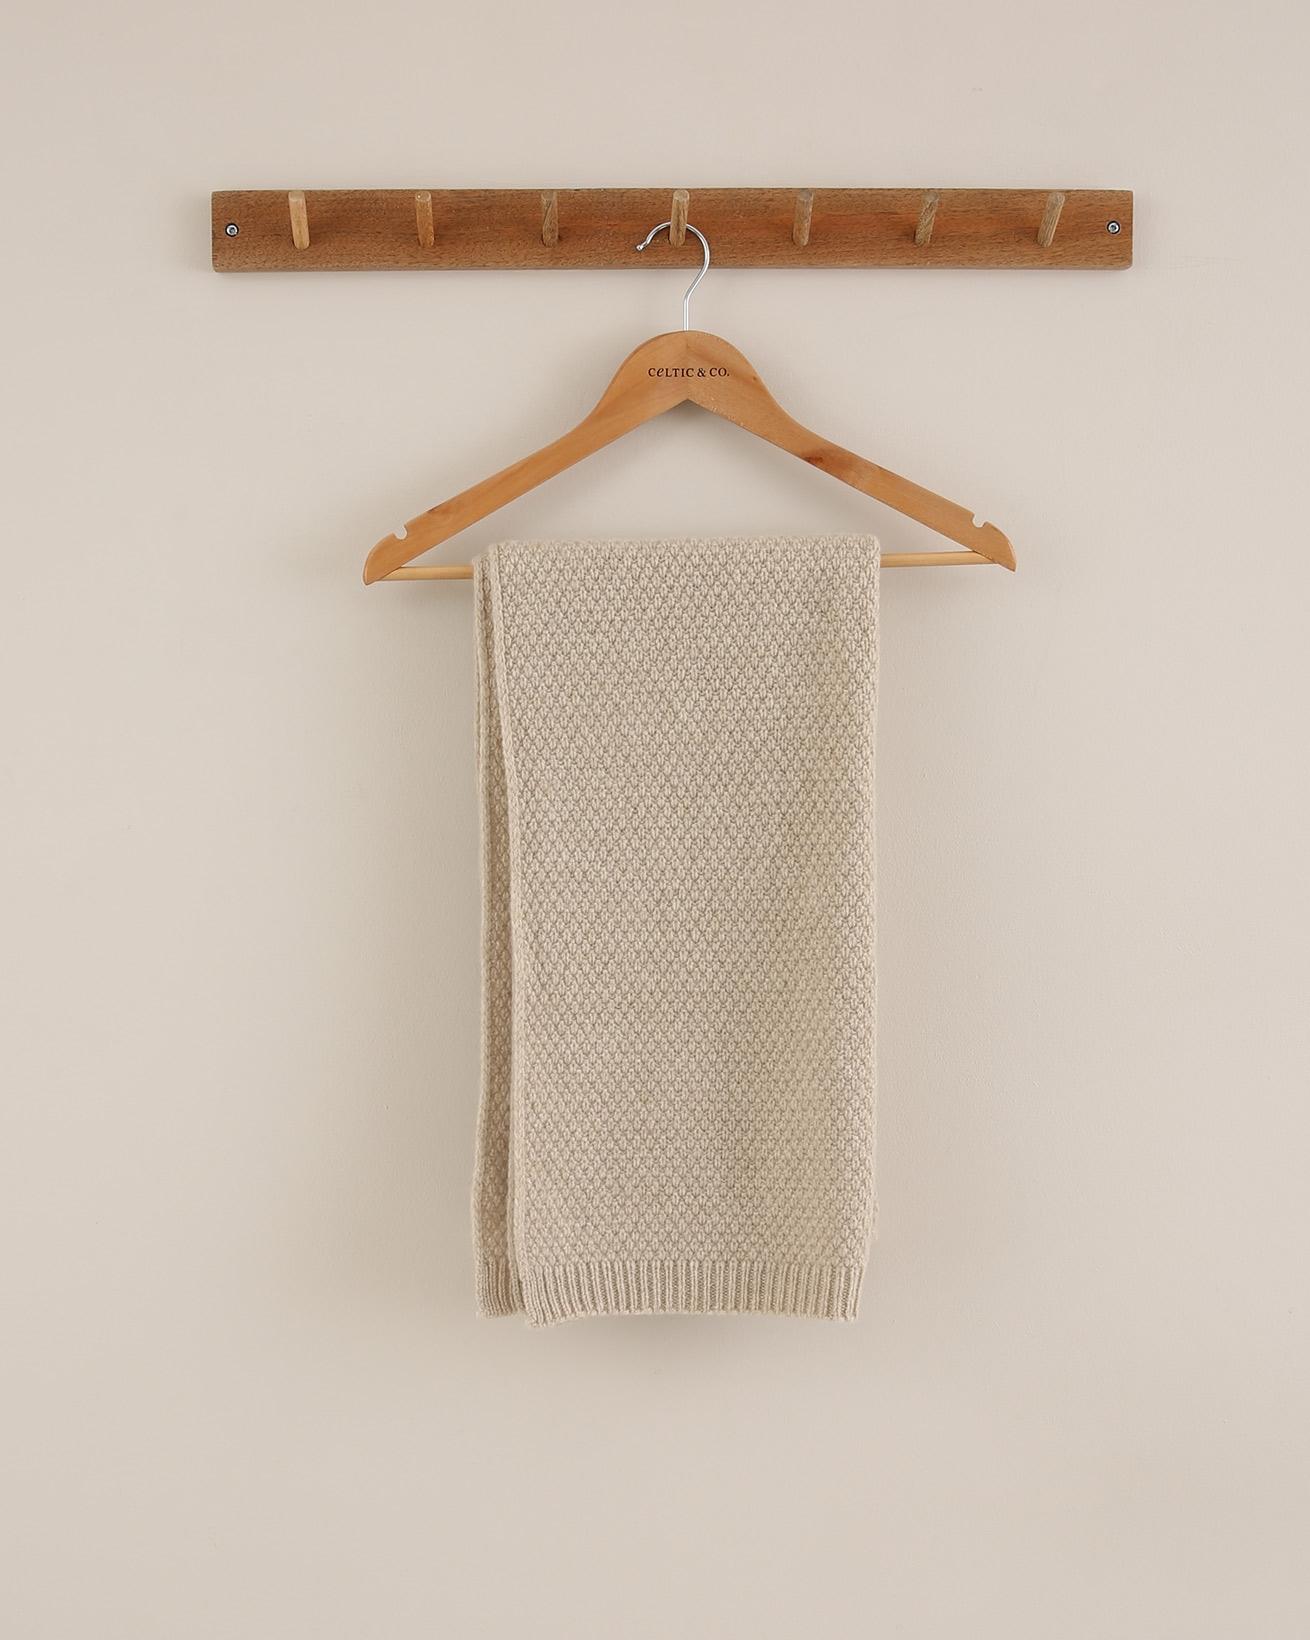 Moss Stitch Knit Scarf - One Size - Oatmeal - 1790